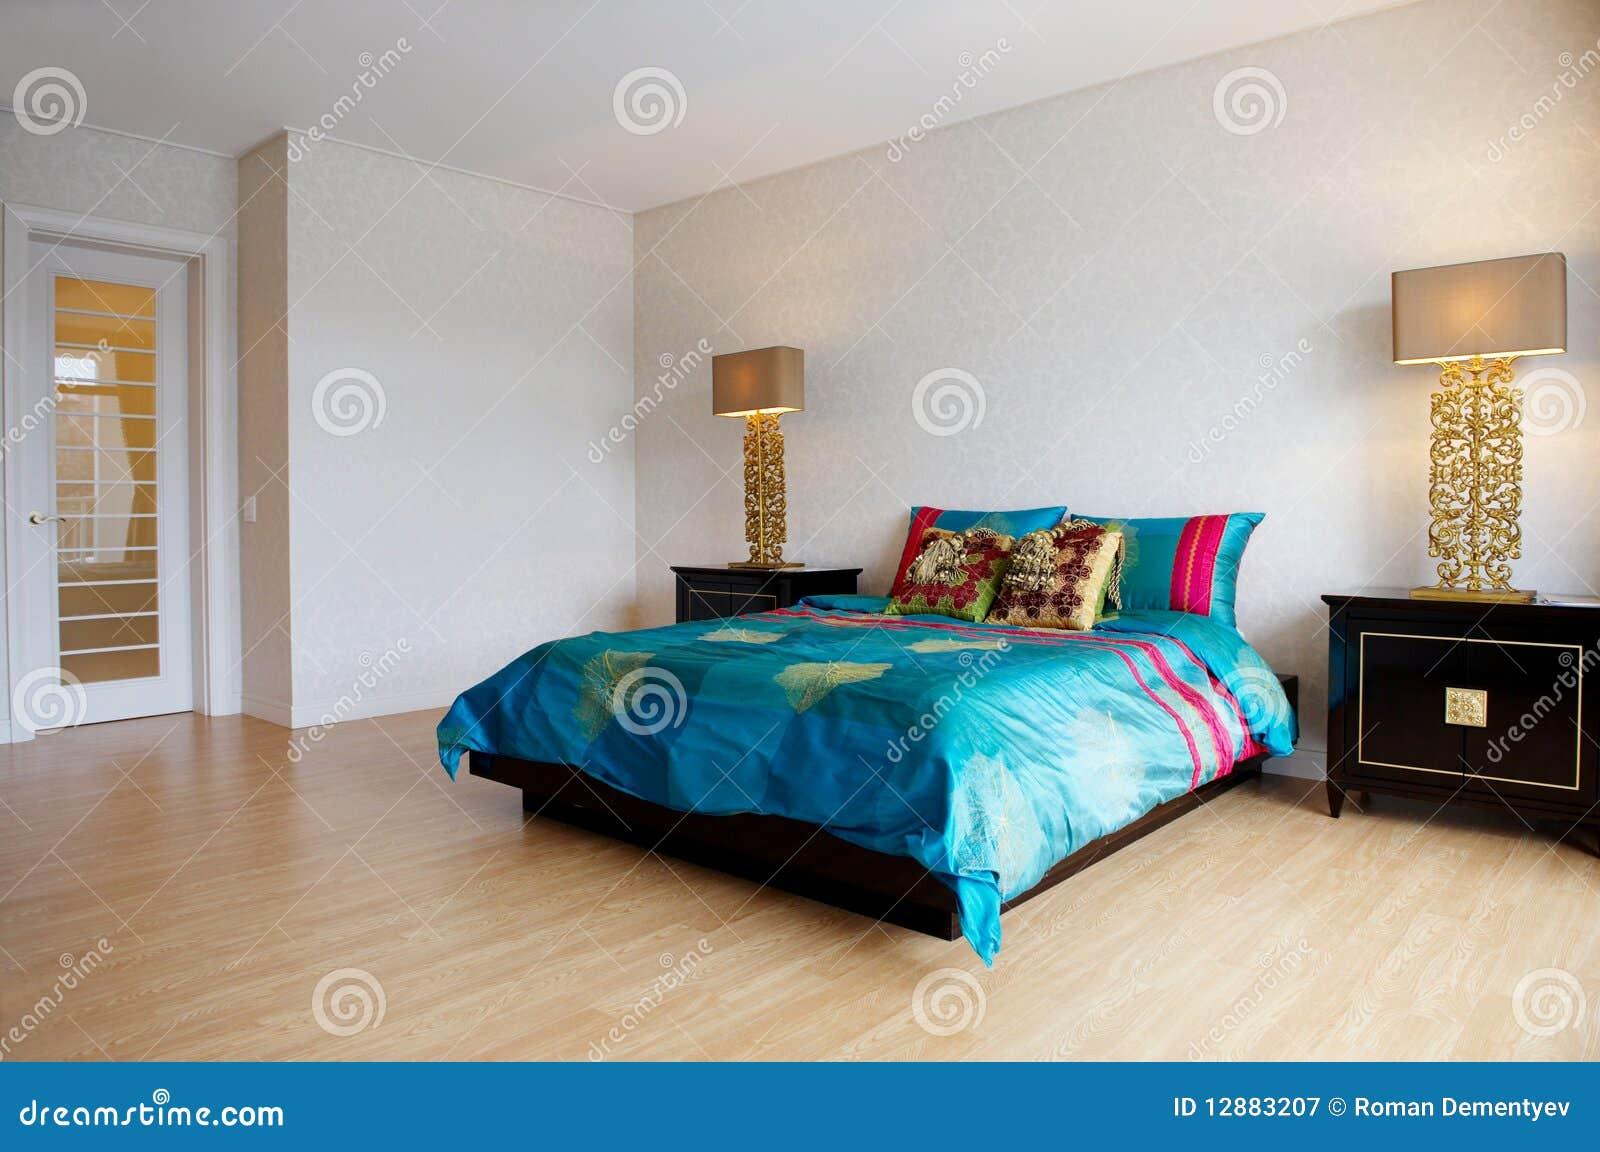 Dormitorio espacioso con muebles modernos